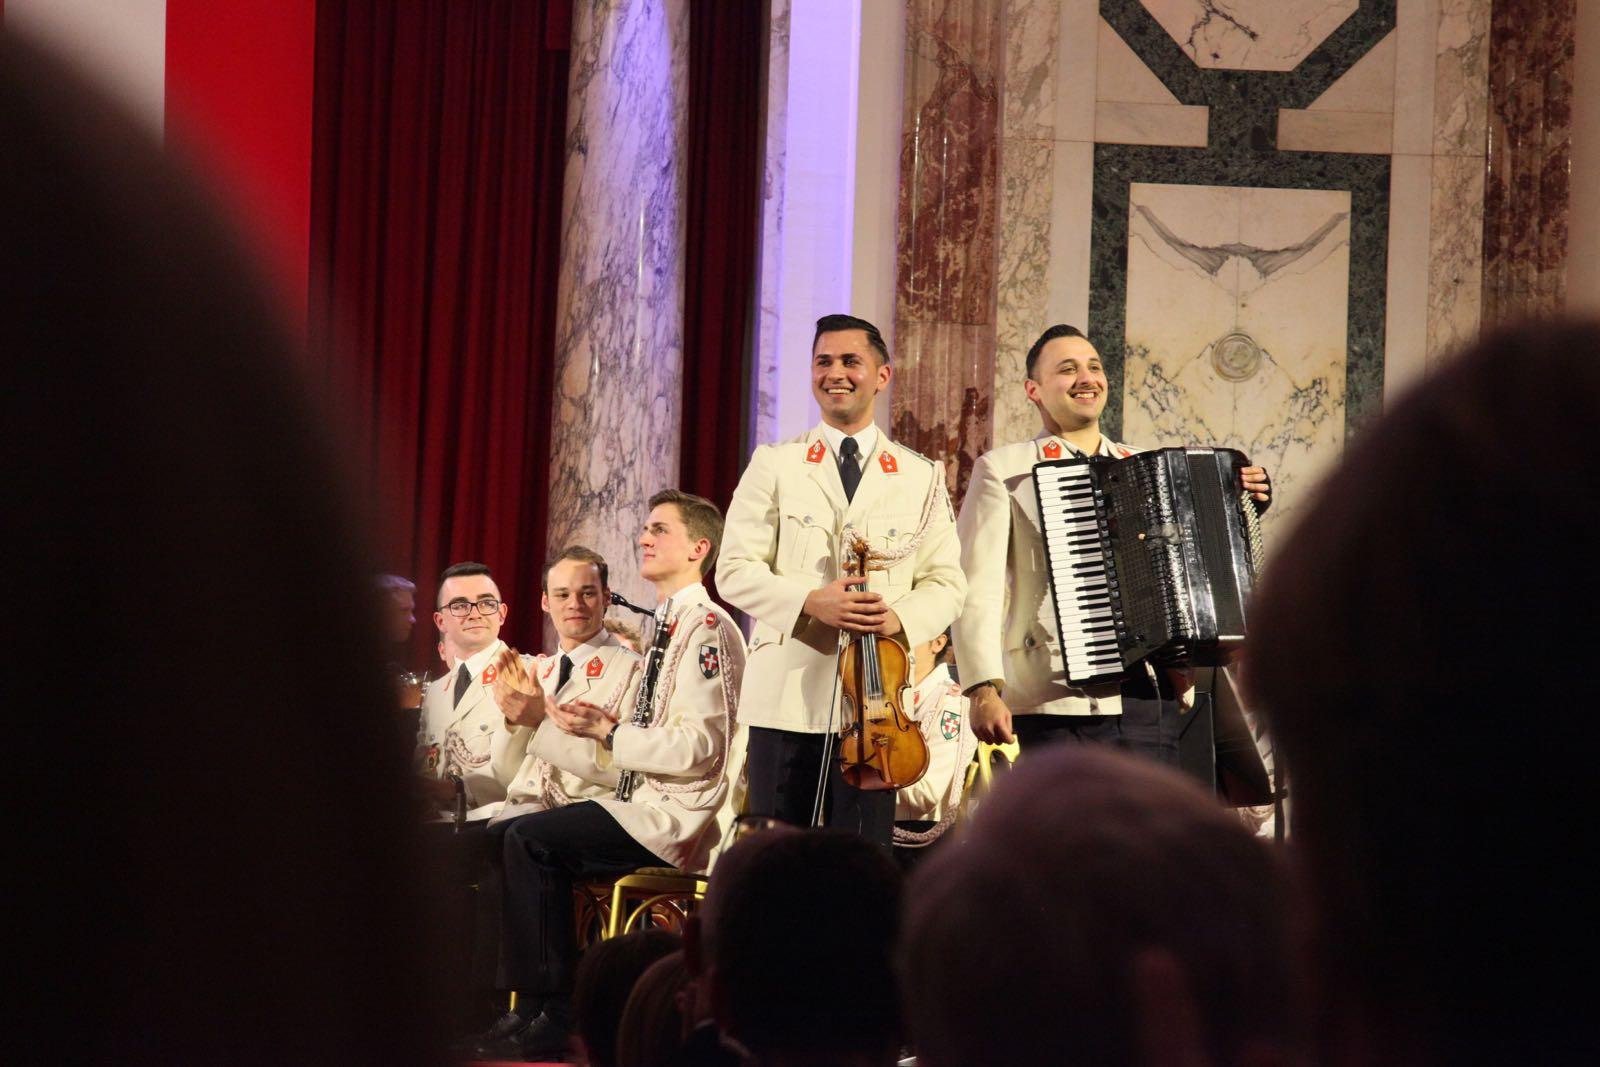 2019_03_14Gardemusik_Frühjahrskonzert_HBP_Hofburg - 106 of 177